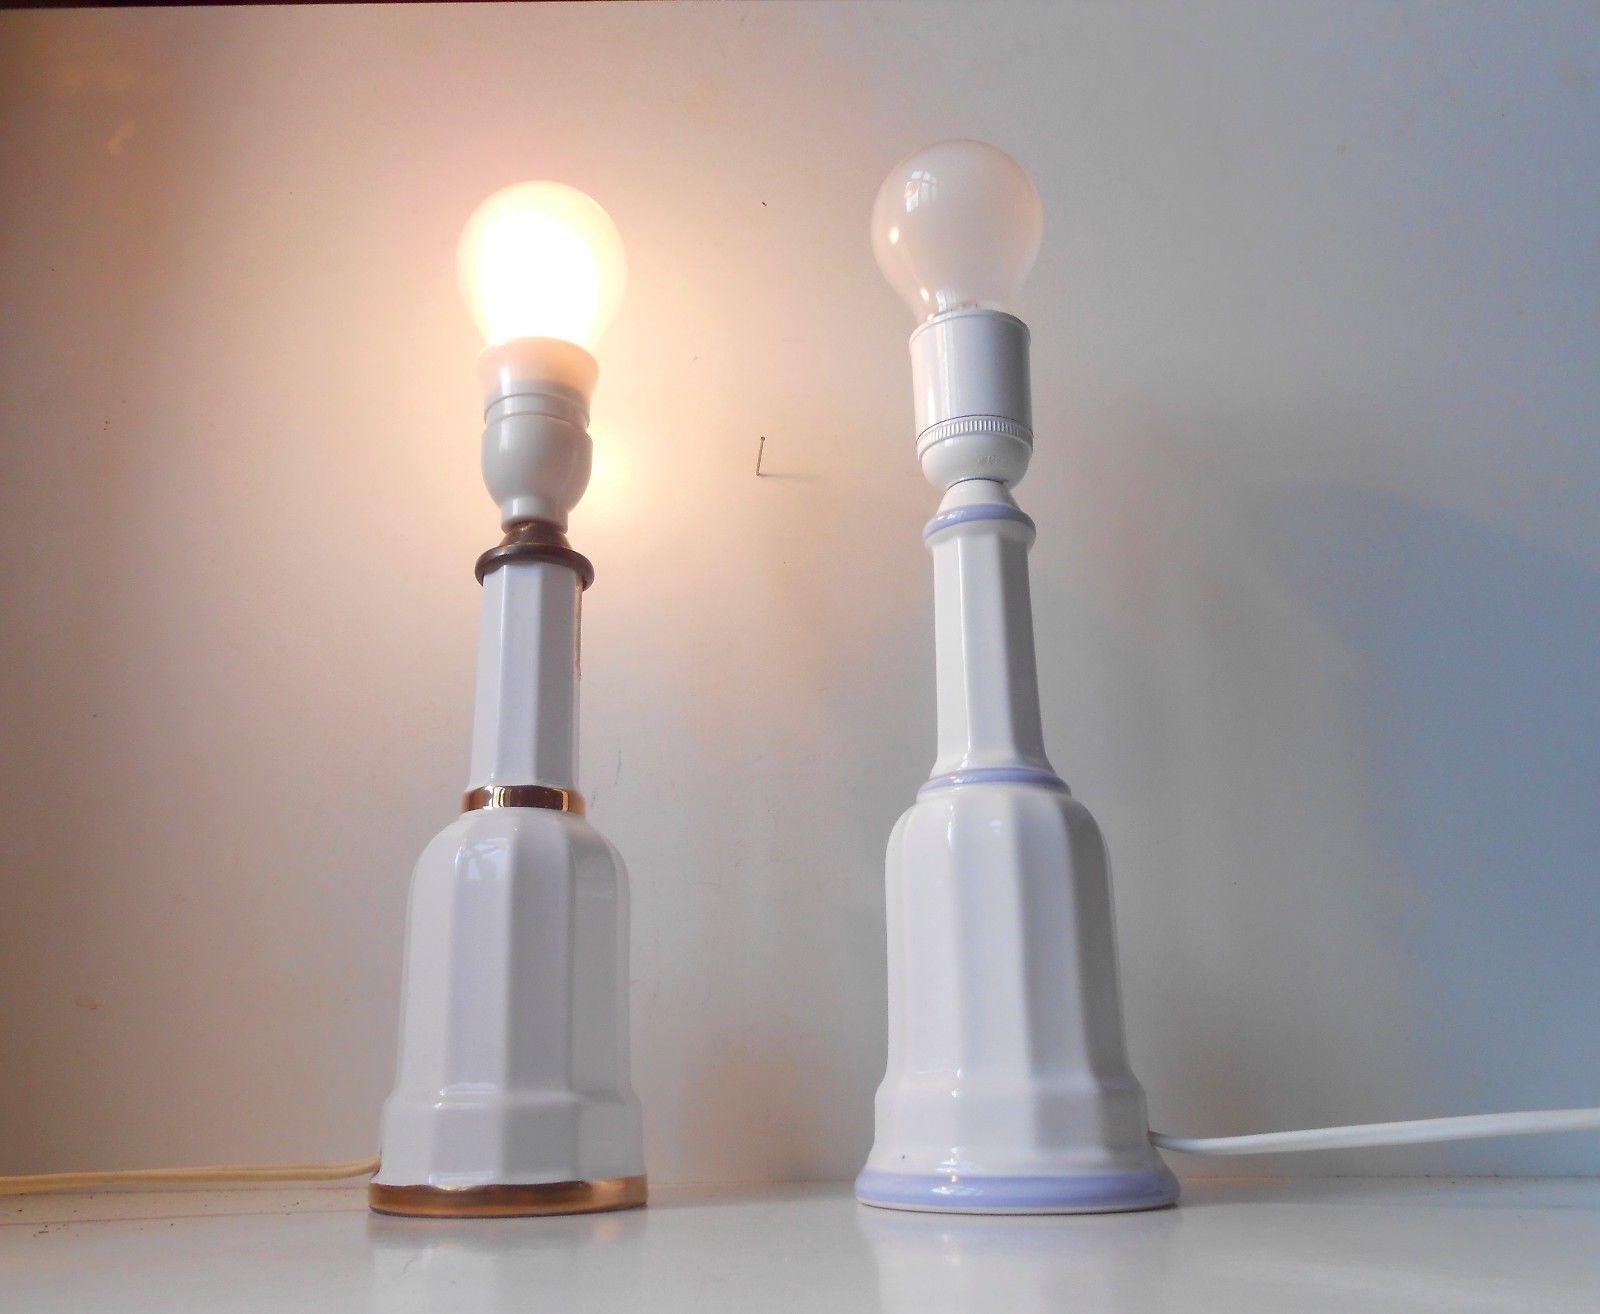 bordlamper retro Et par Søholm 'Heiberg' bordlamper – retro design.dk bordlamper retro